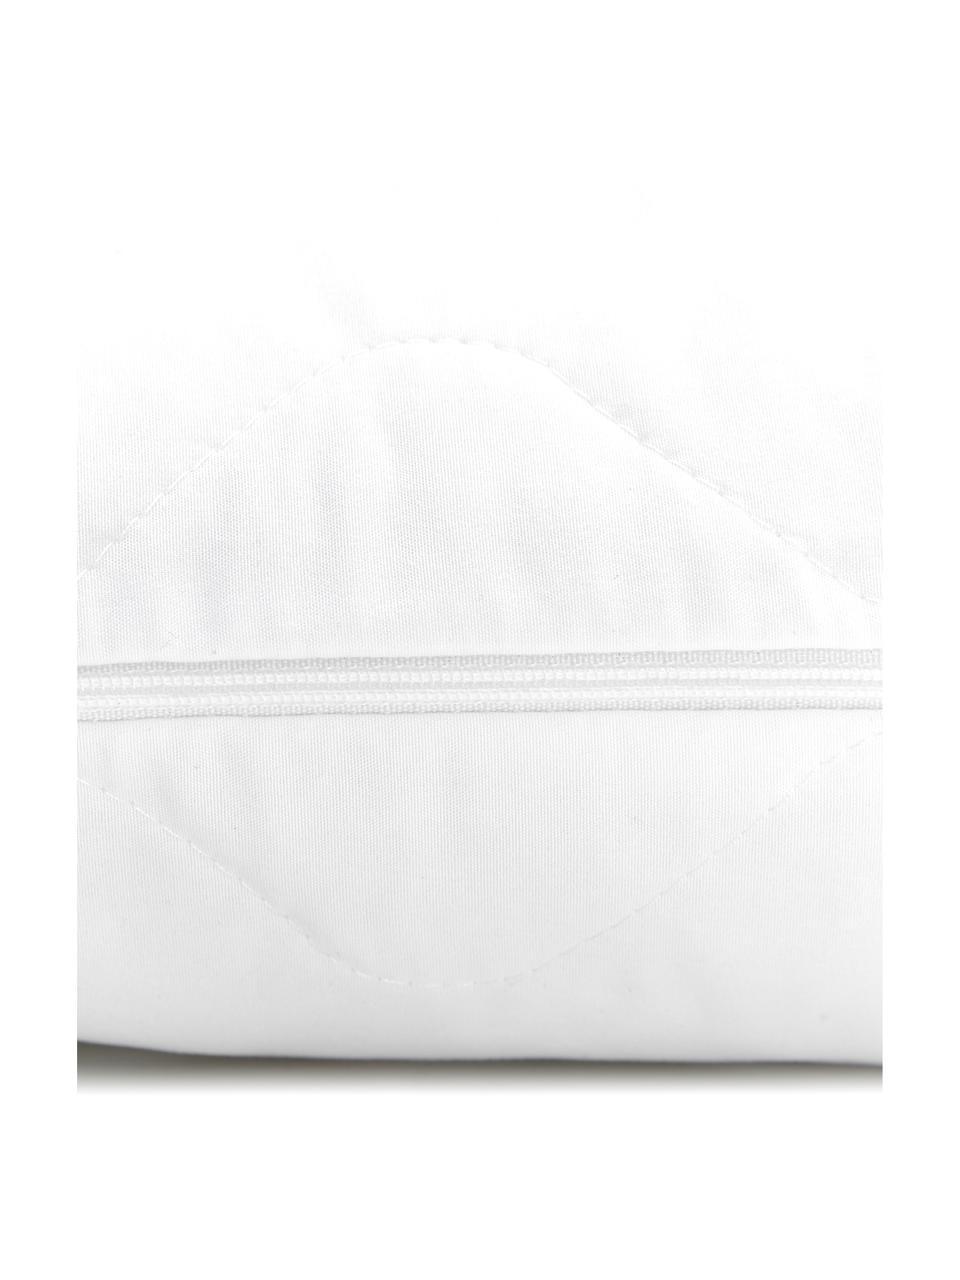 Premium kussenvulling Sia, 30x50, microvezel vulling, Wit, 45 x 45 cm